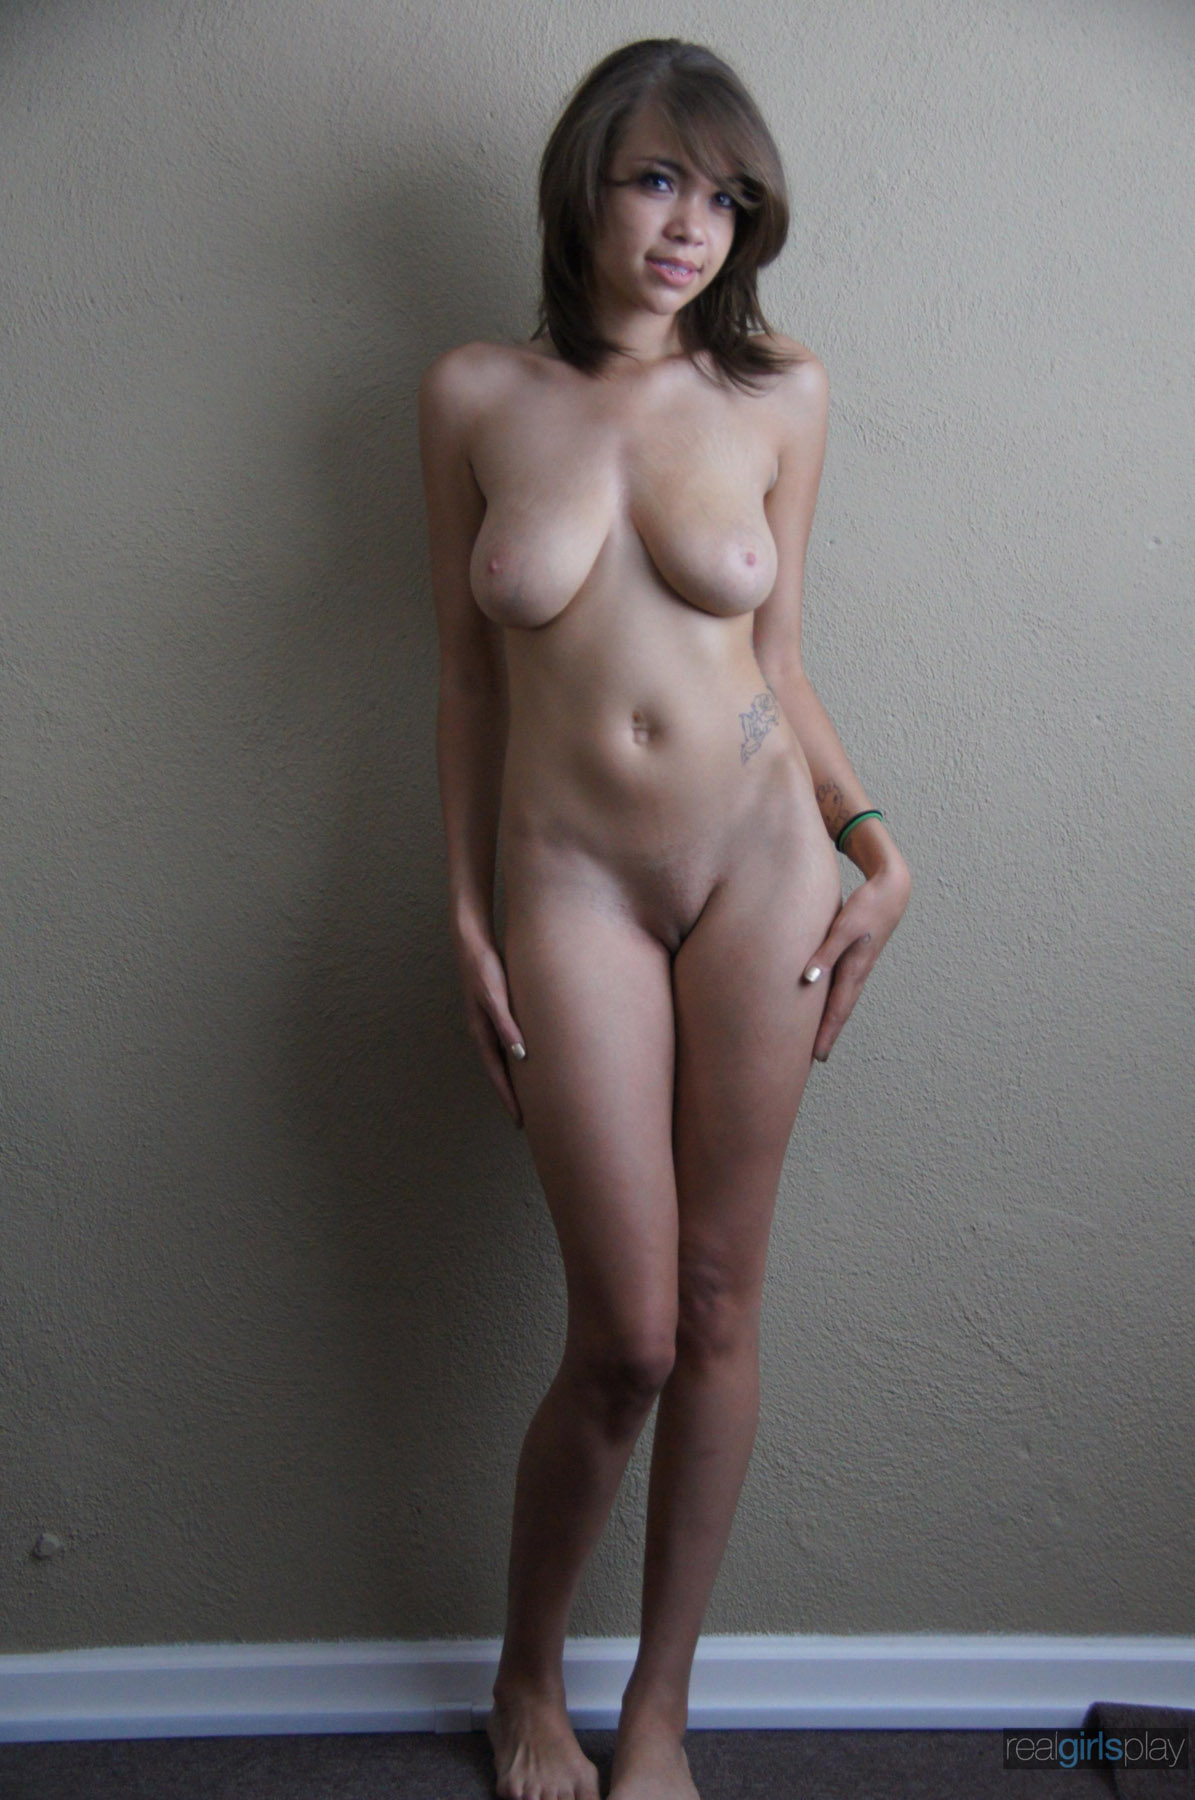 Excited too caroline ellis nude consider, that